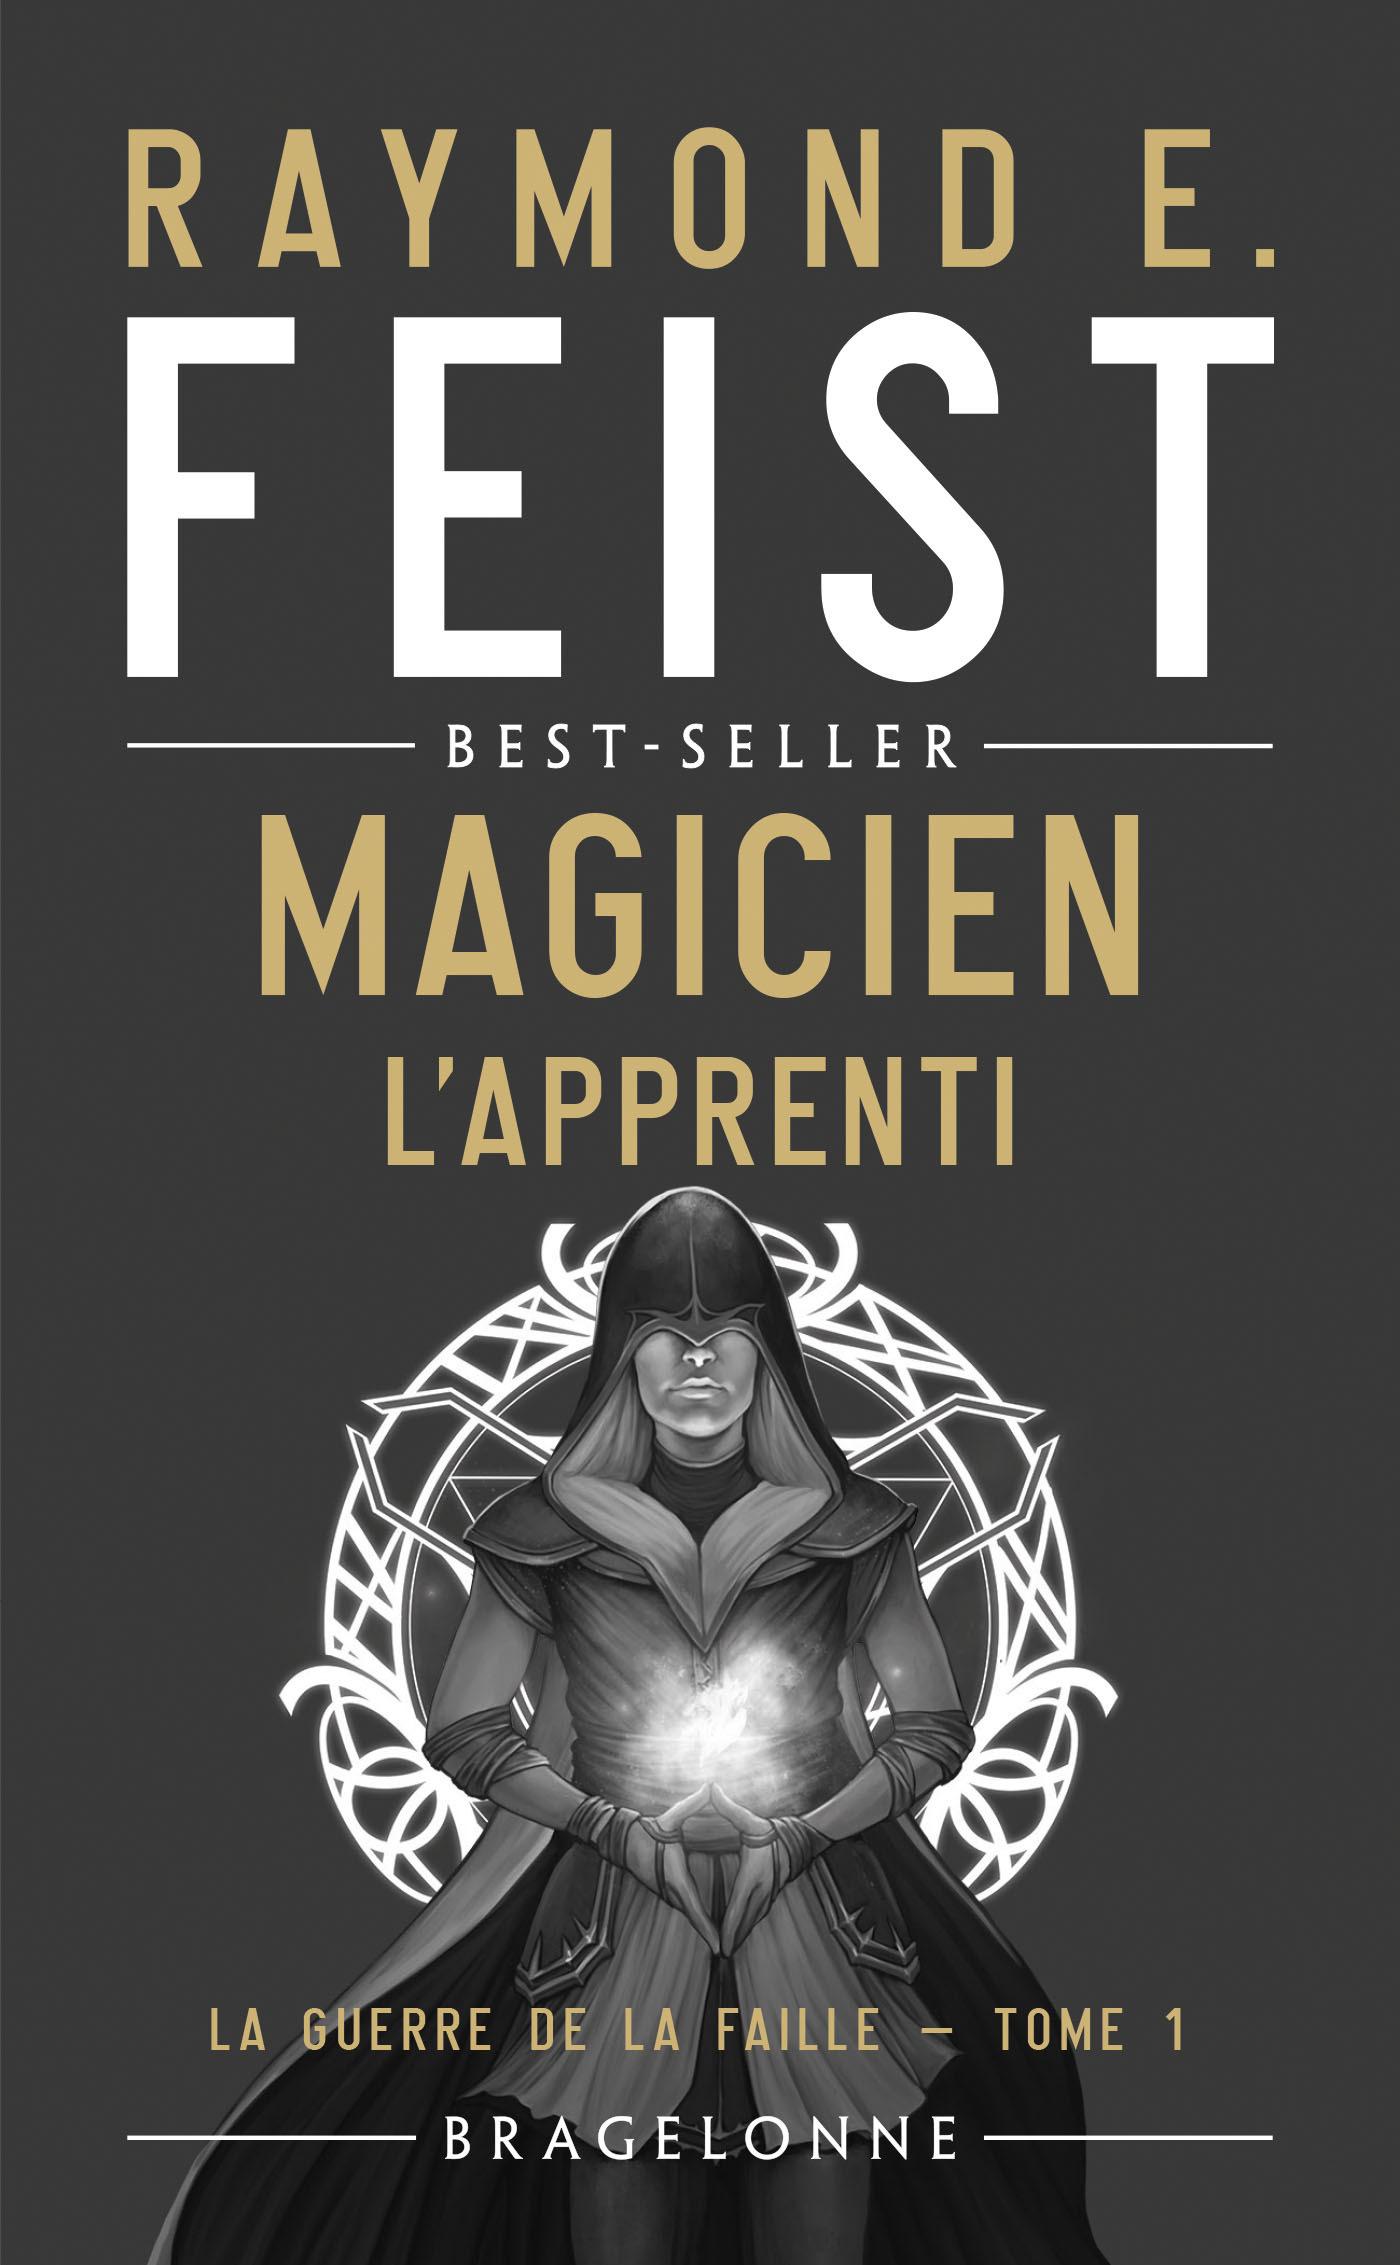 Magicien - L'Apprenti, LA GUERRE DE LA FAILLE, T1